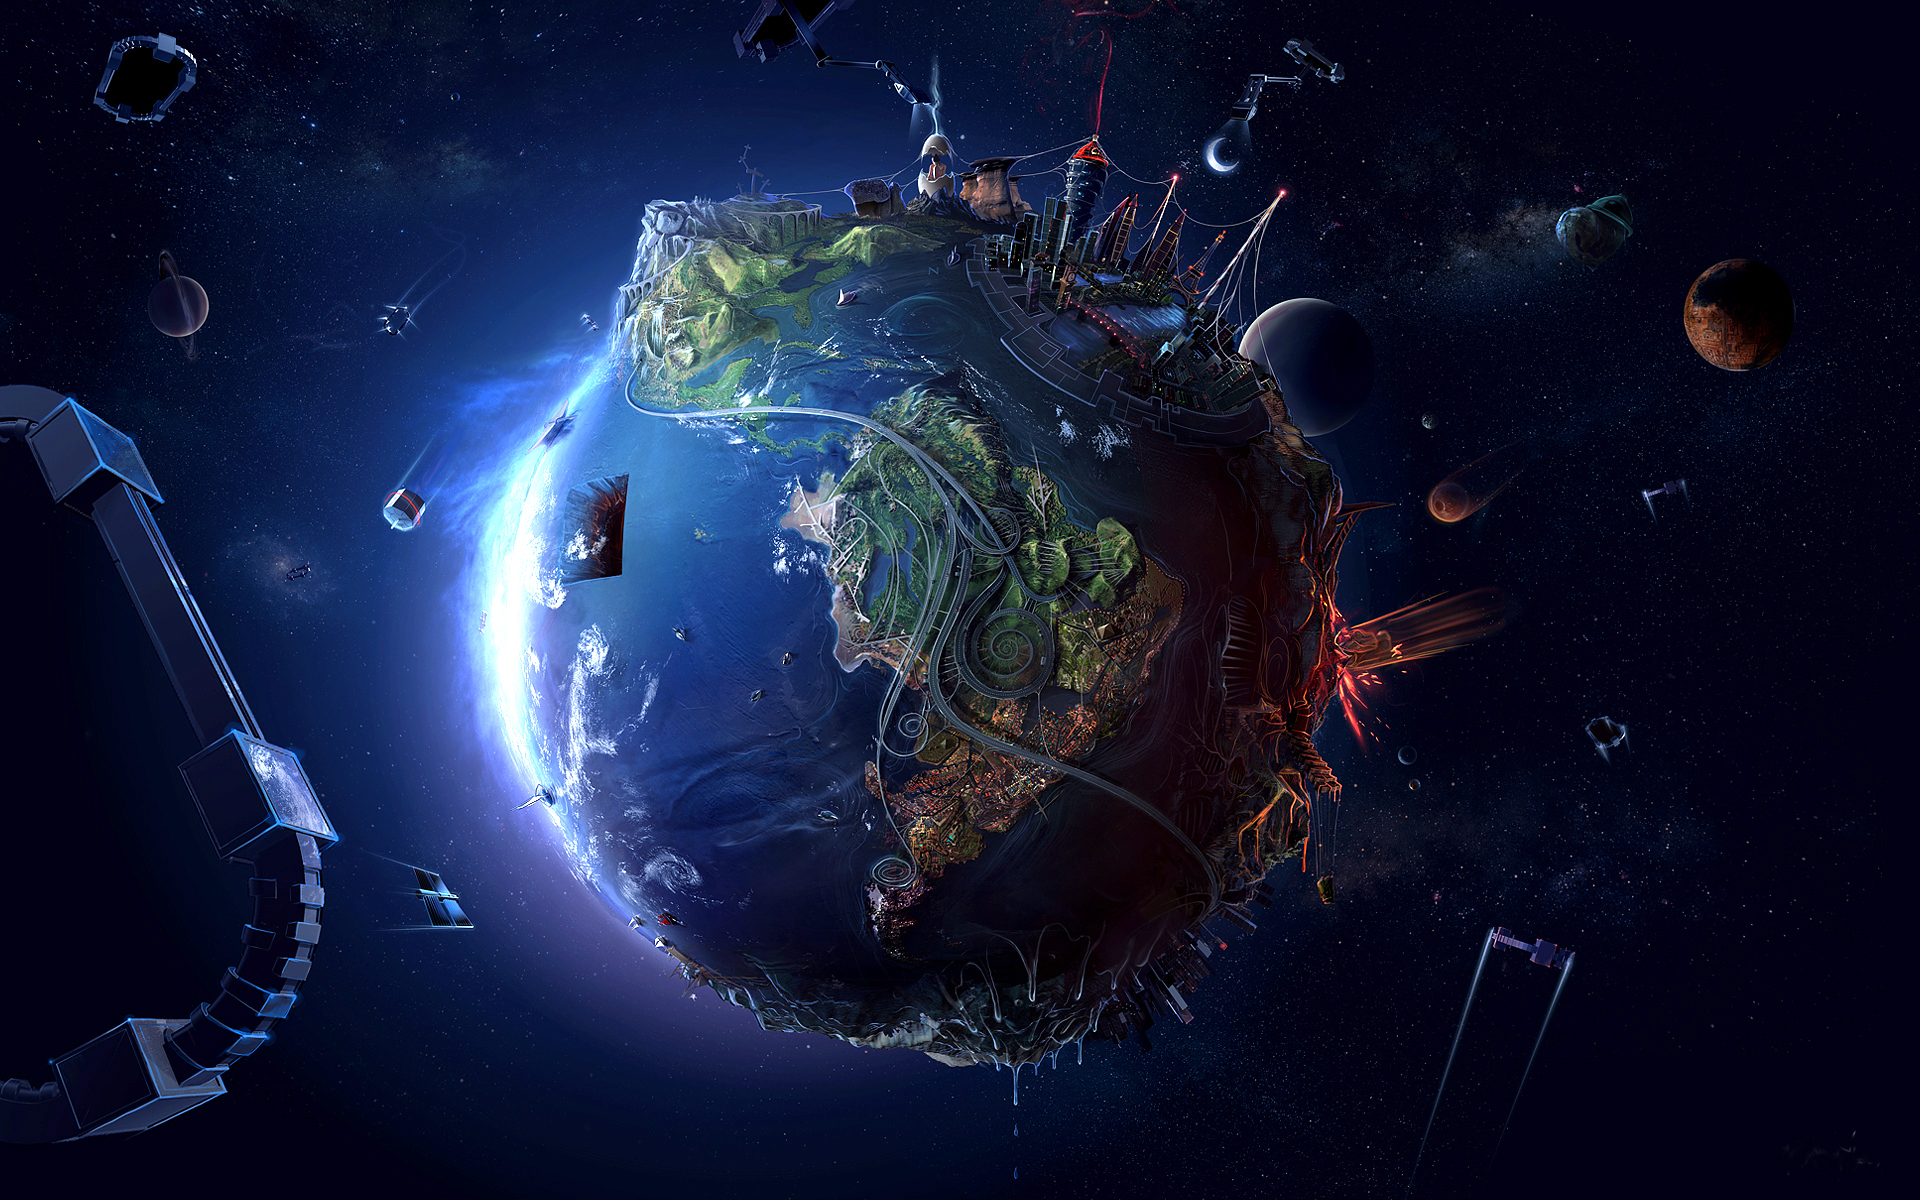 gatloc universe